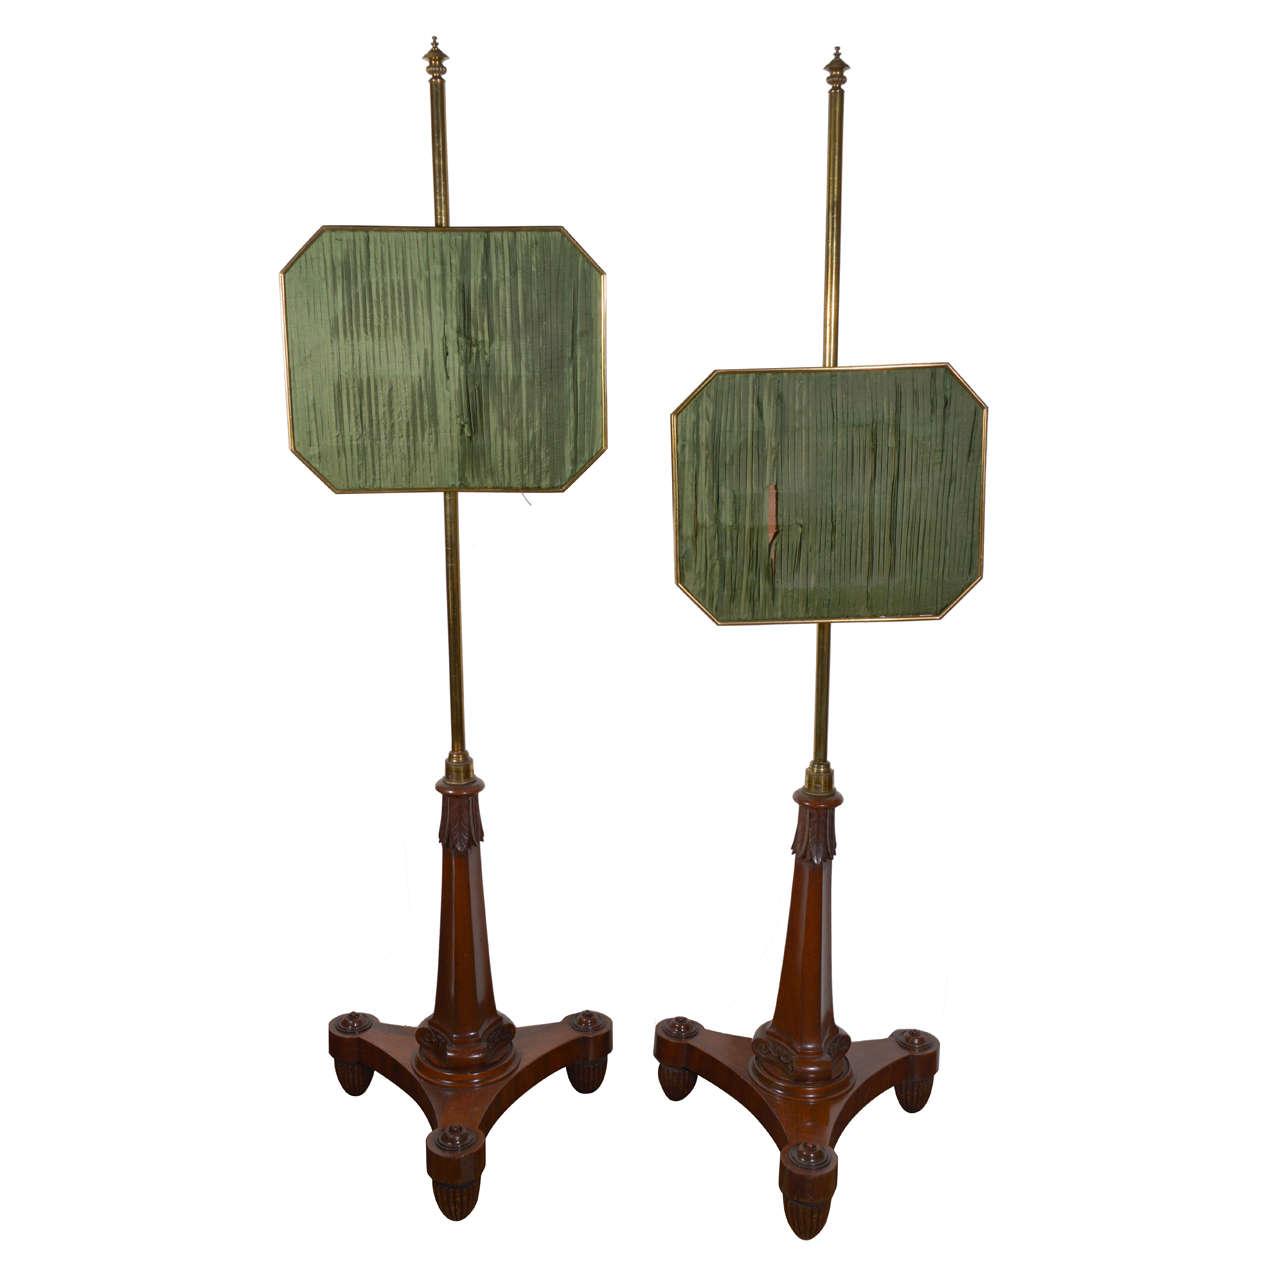 Pair of Regency Gilt-Brass Mounted Pole Screens